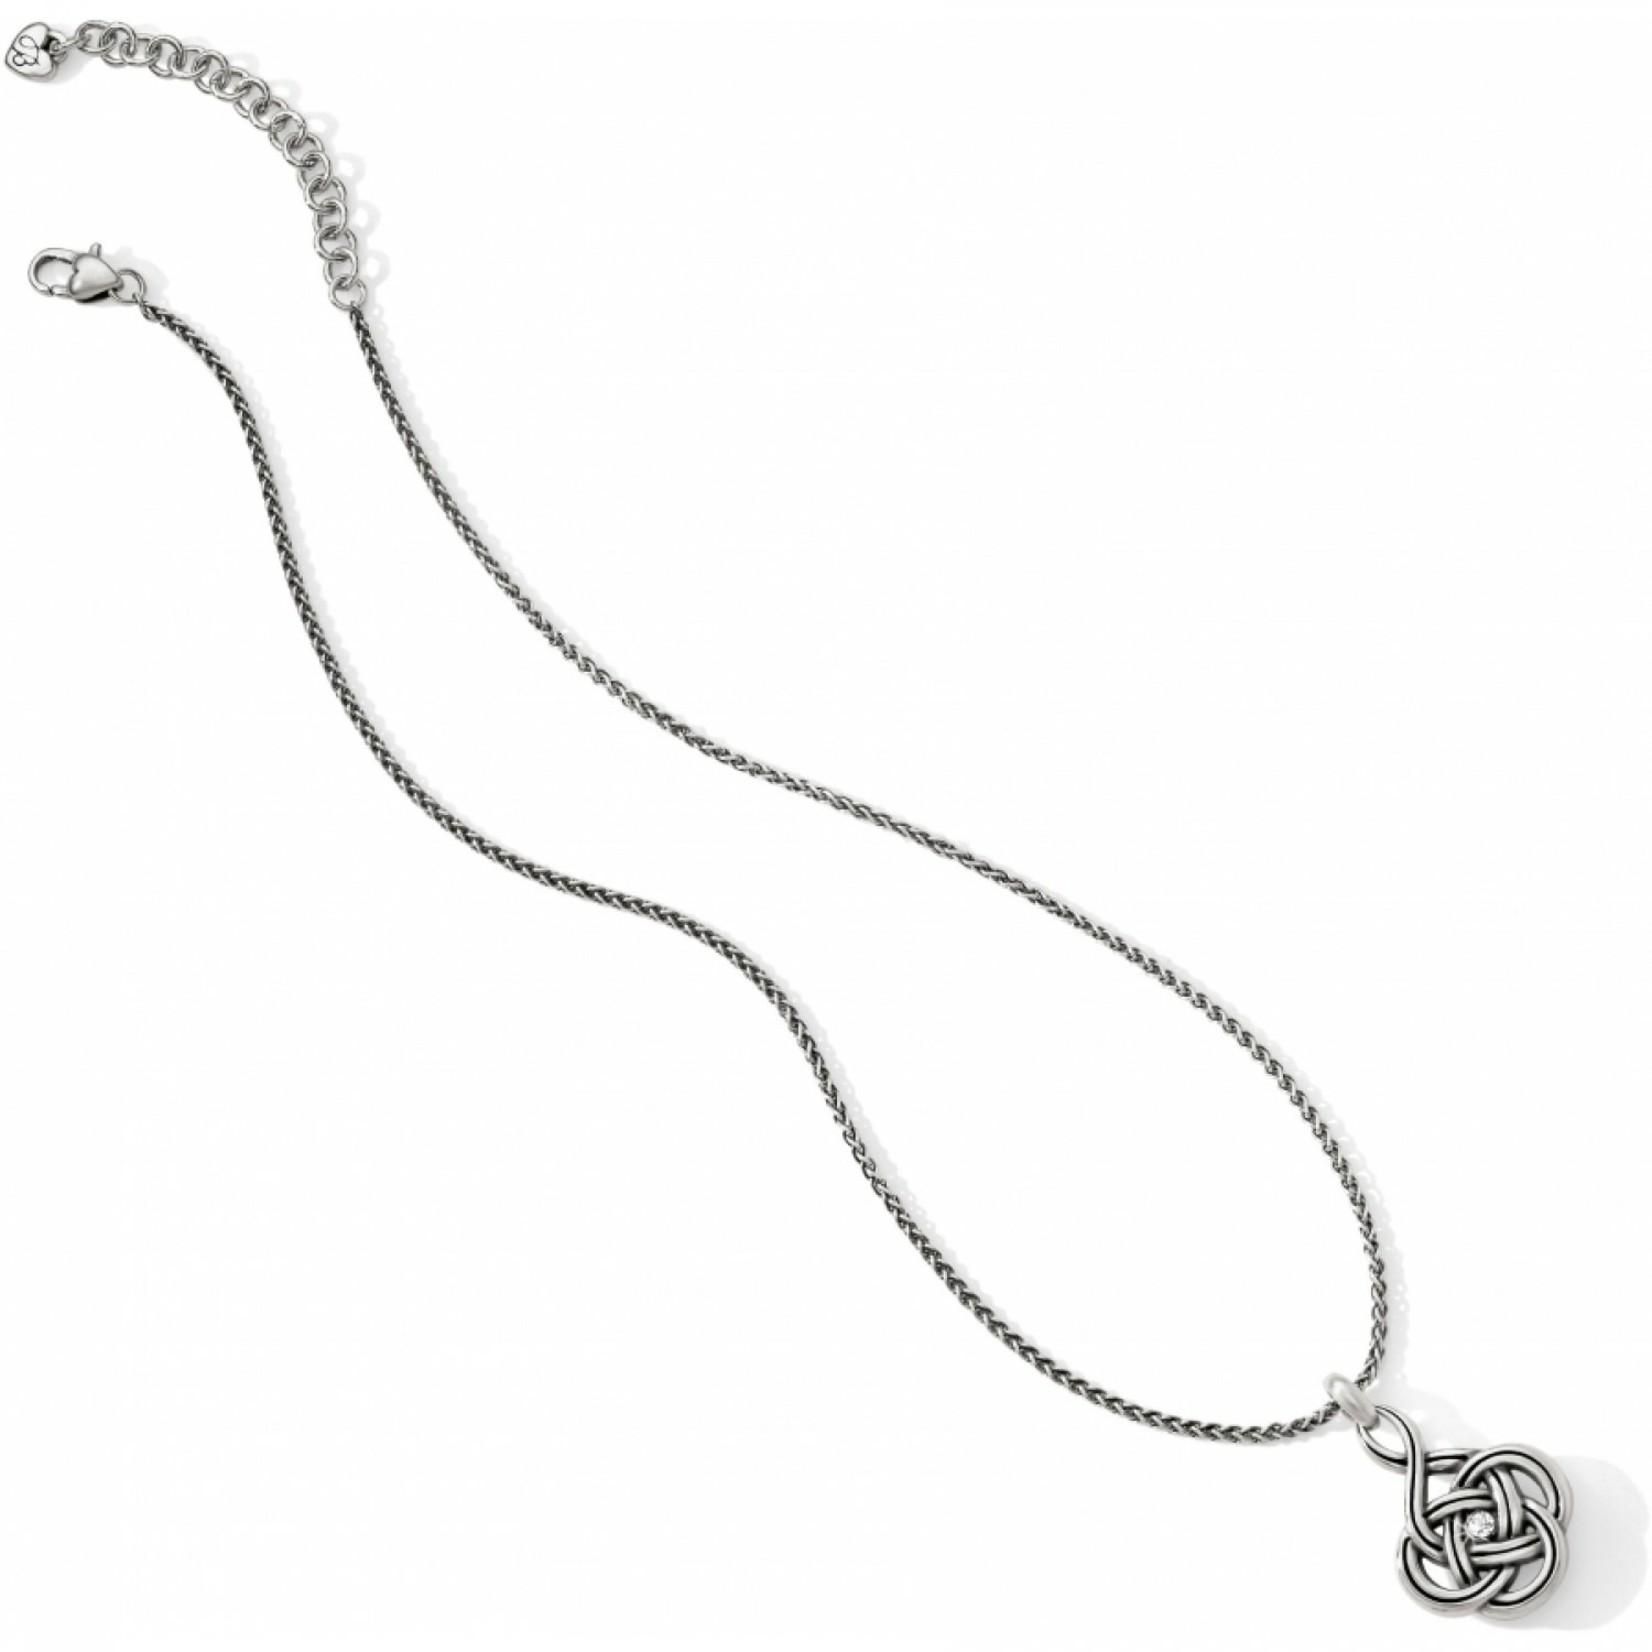 Brighton JL5281 Interlok Petite Necklace